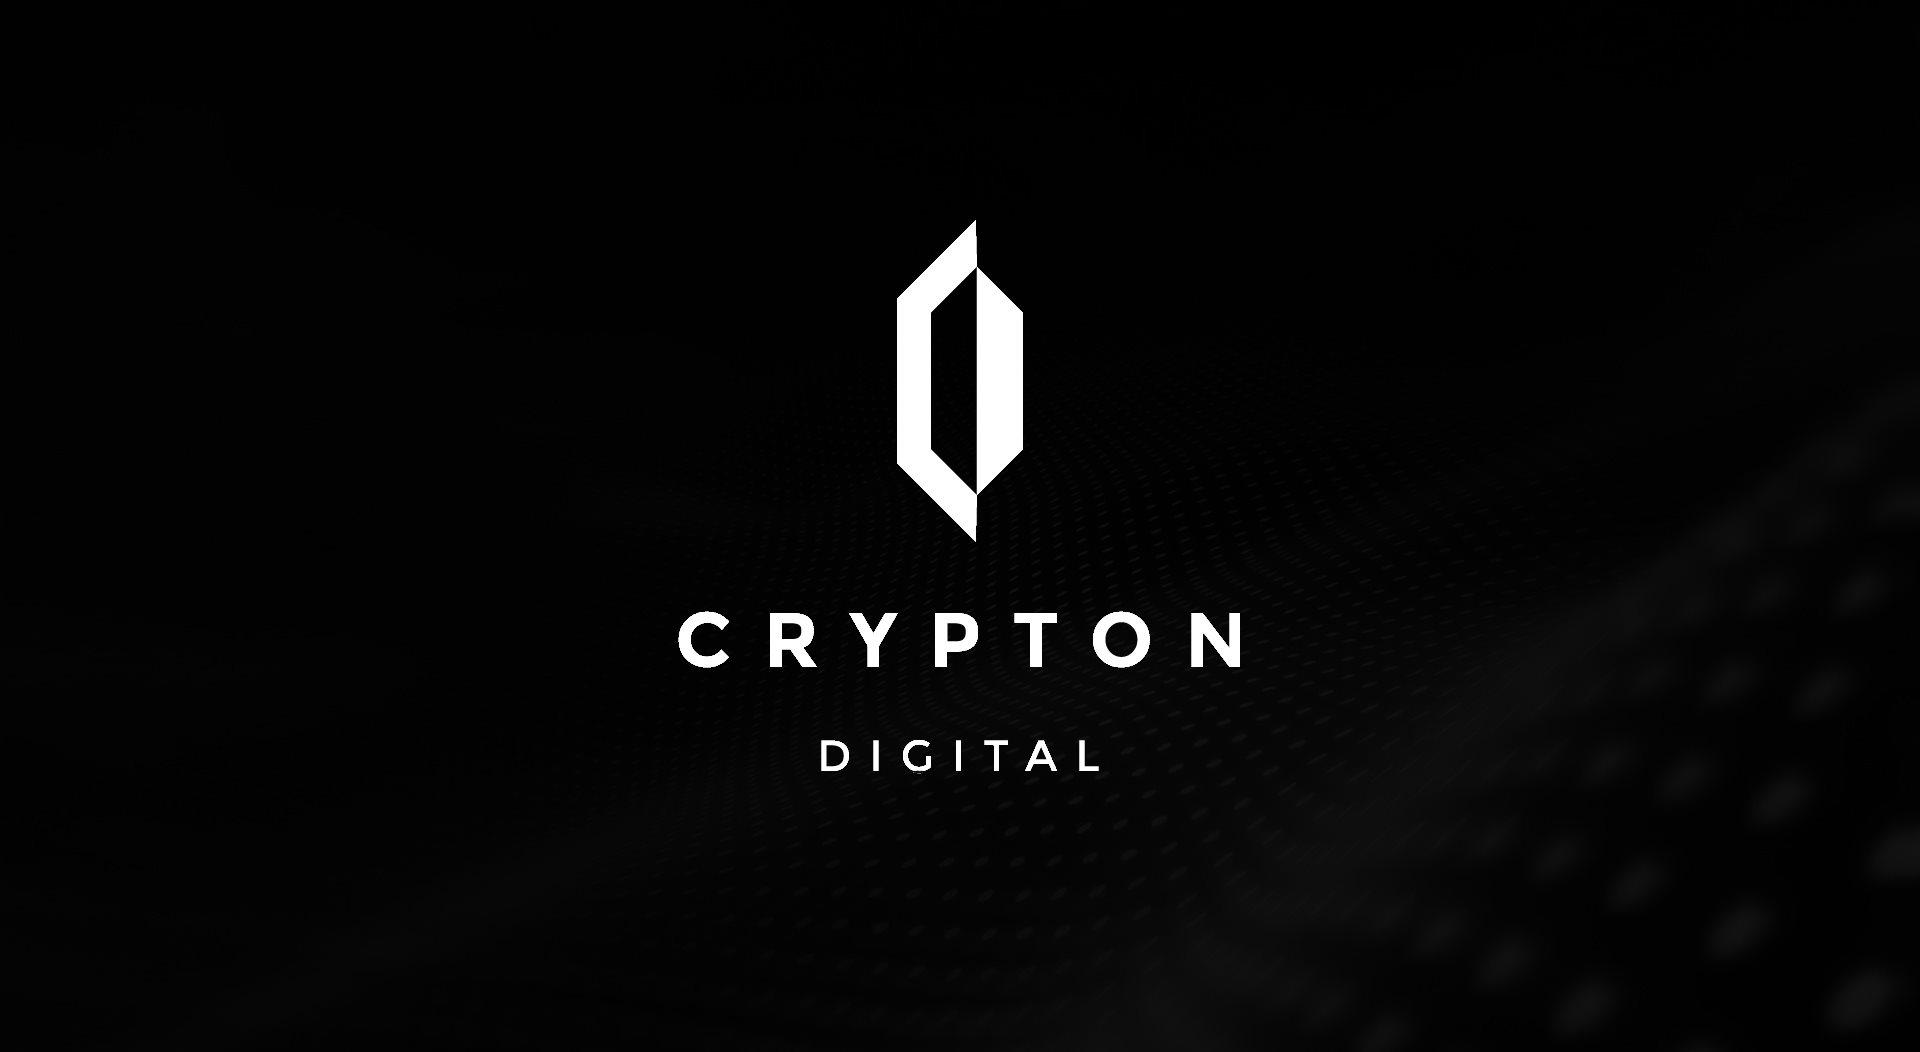 CRYPTON DIGITAL